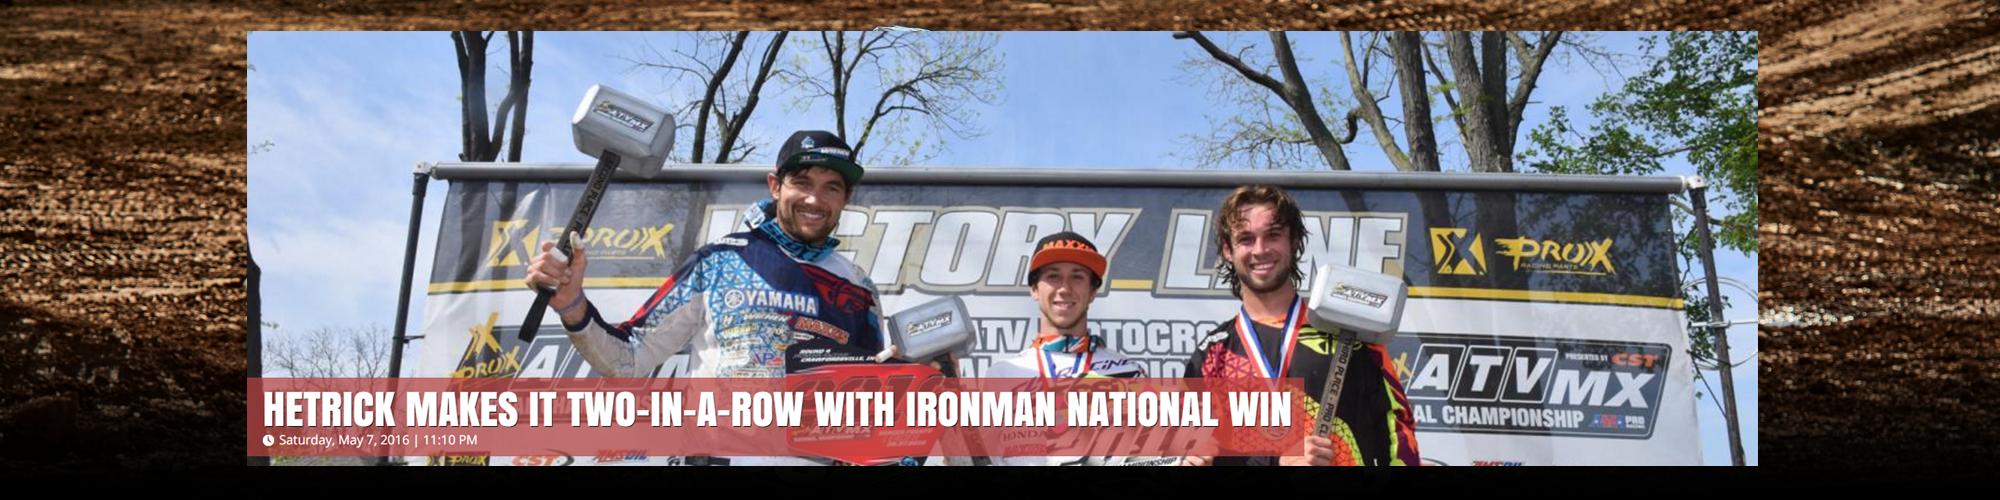 News-7-5-2016-Ironman-1